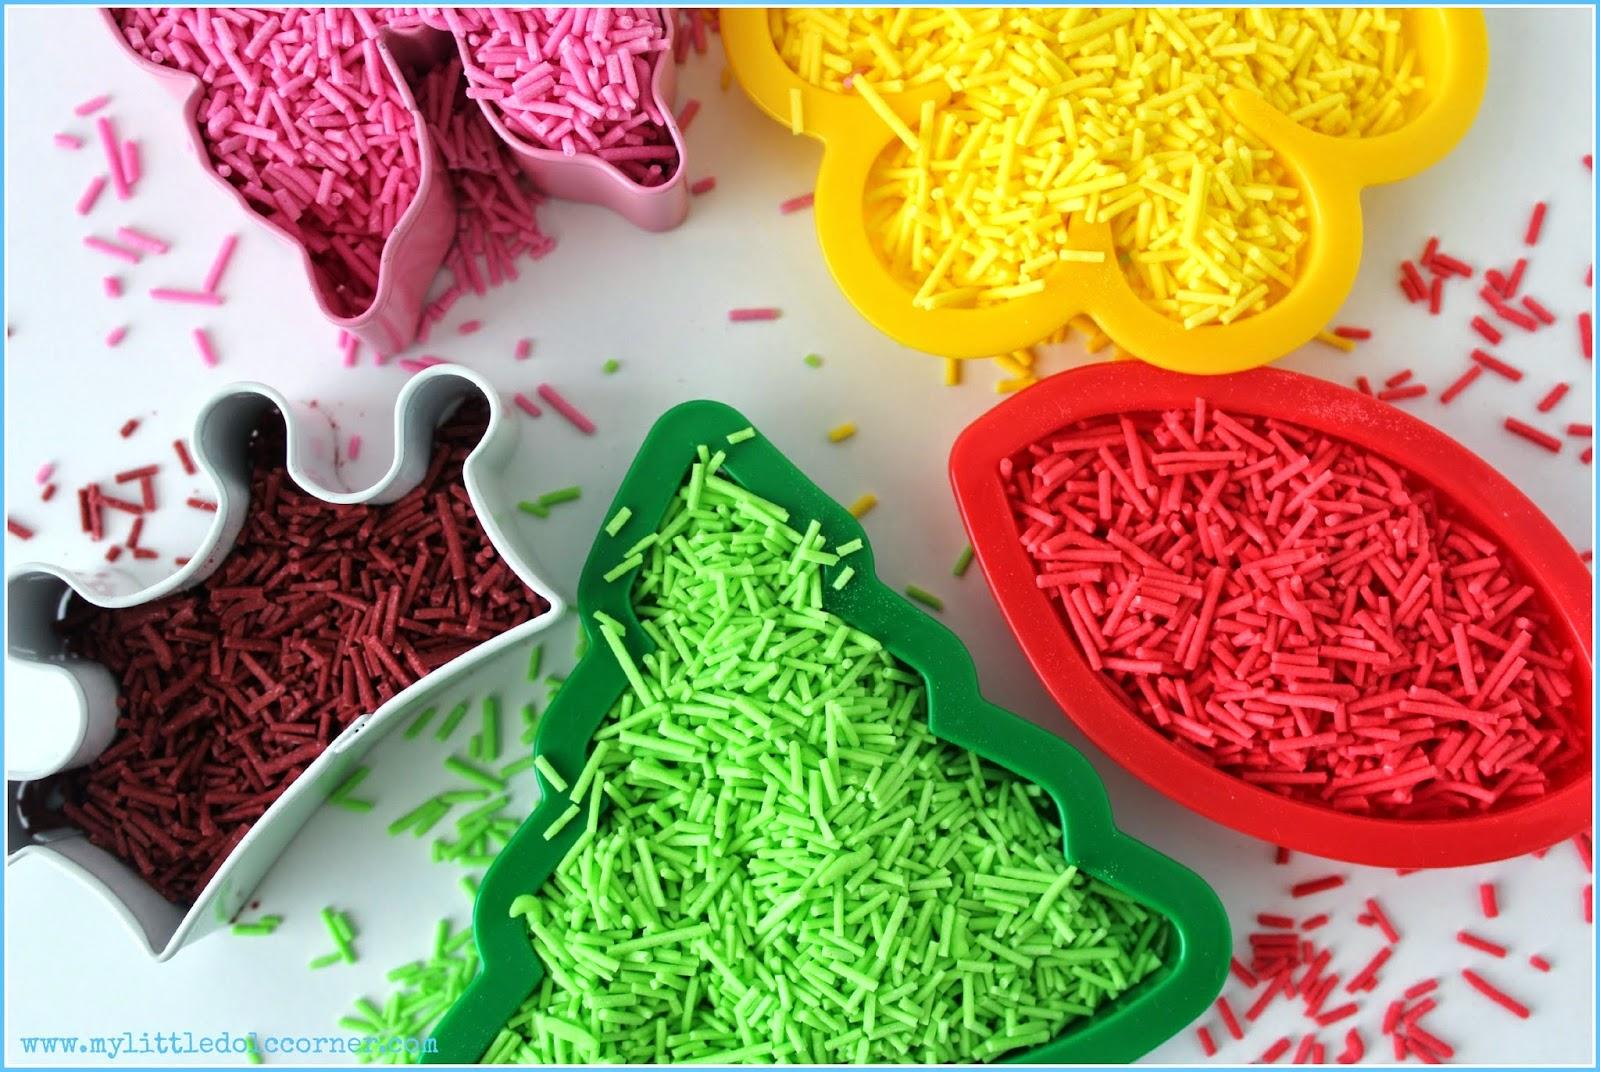 sprinklesfideoscoloresc